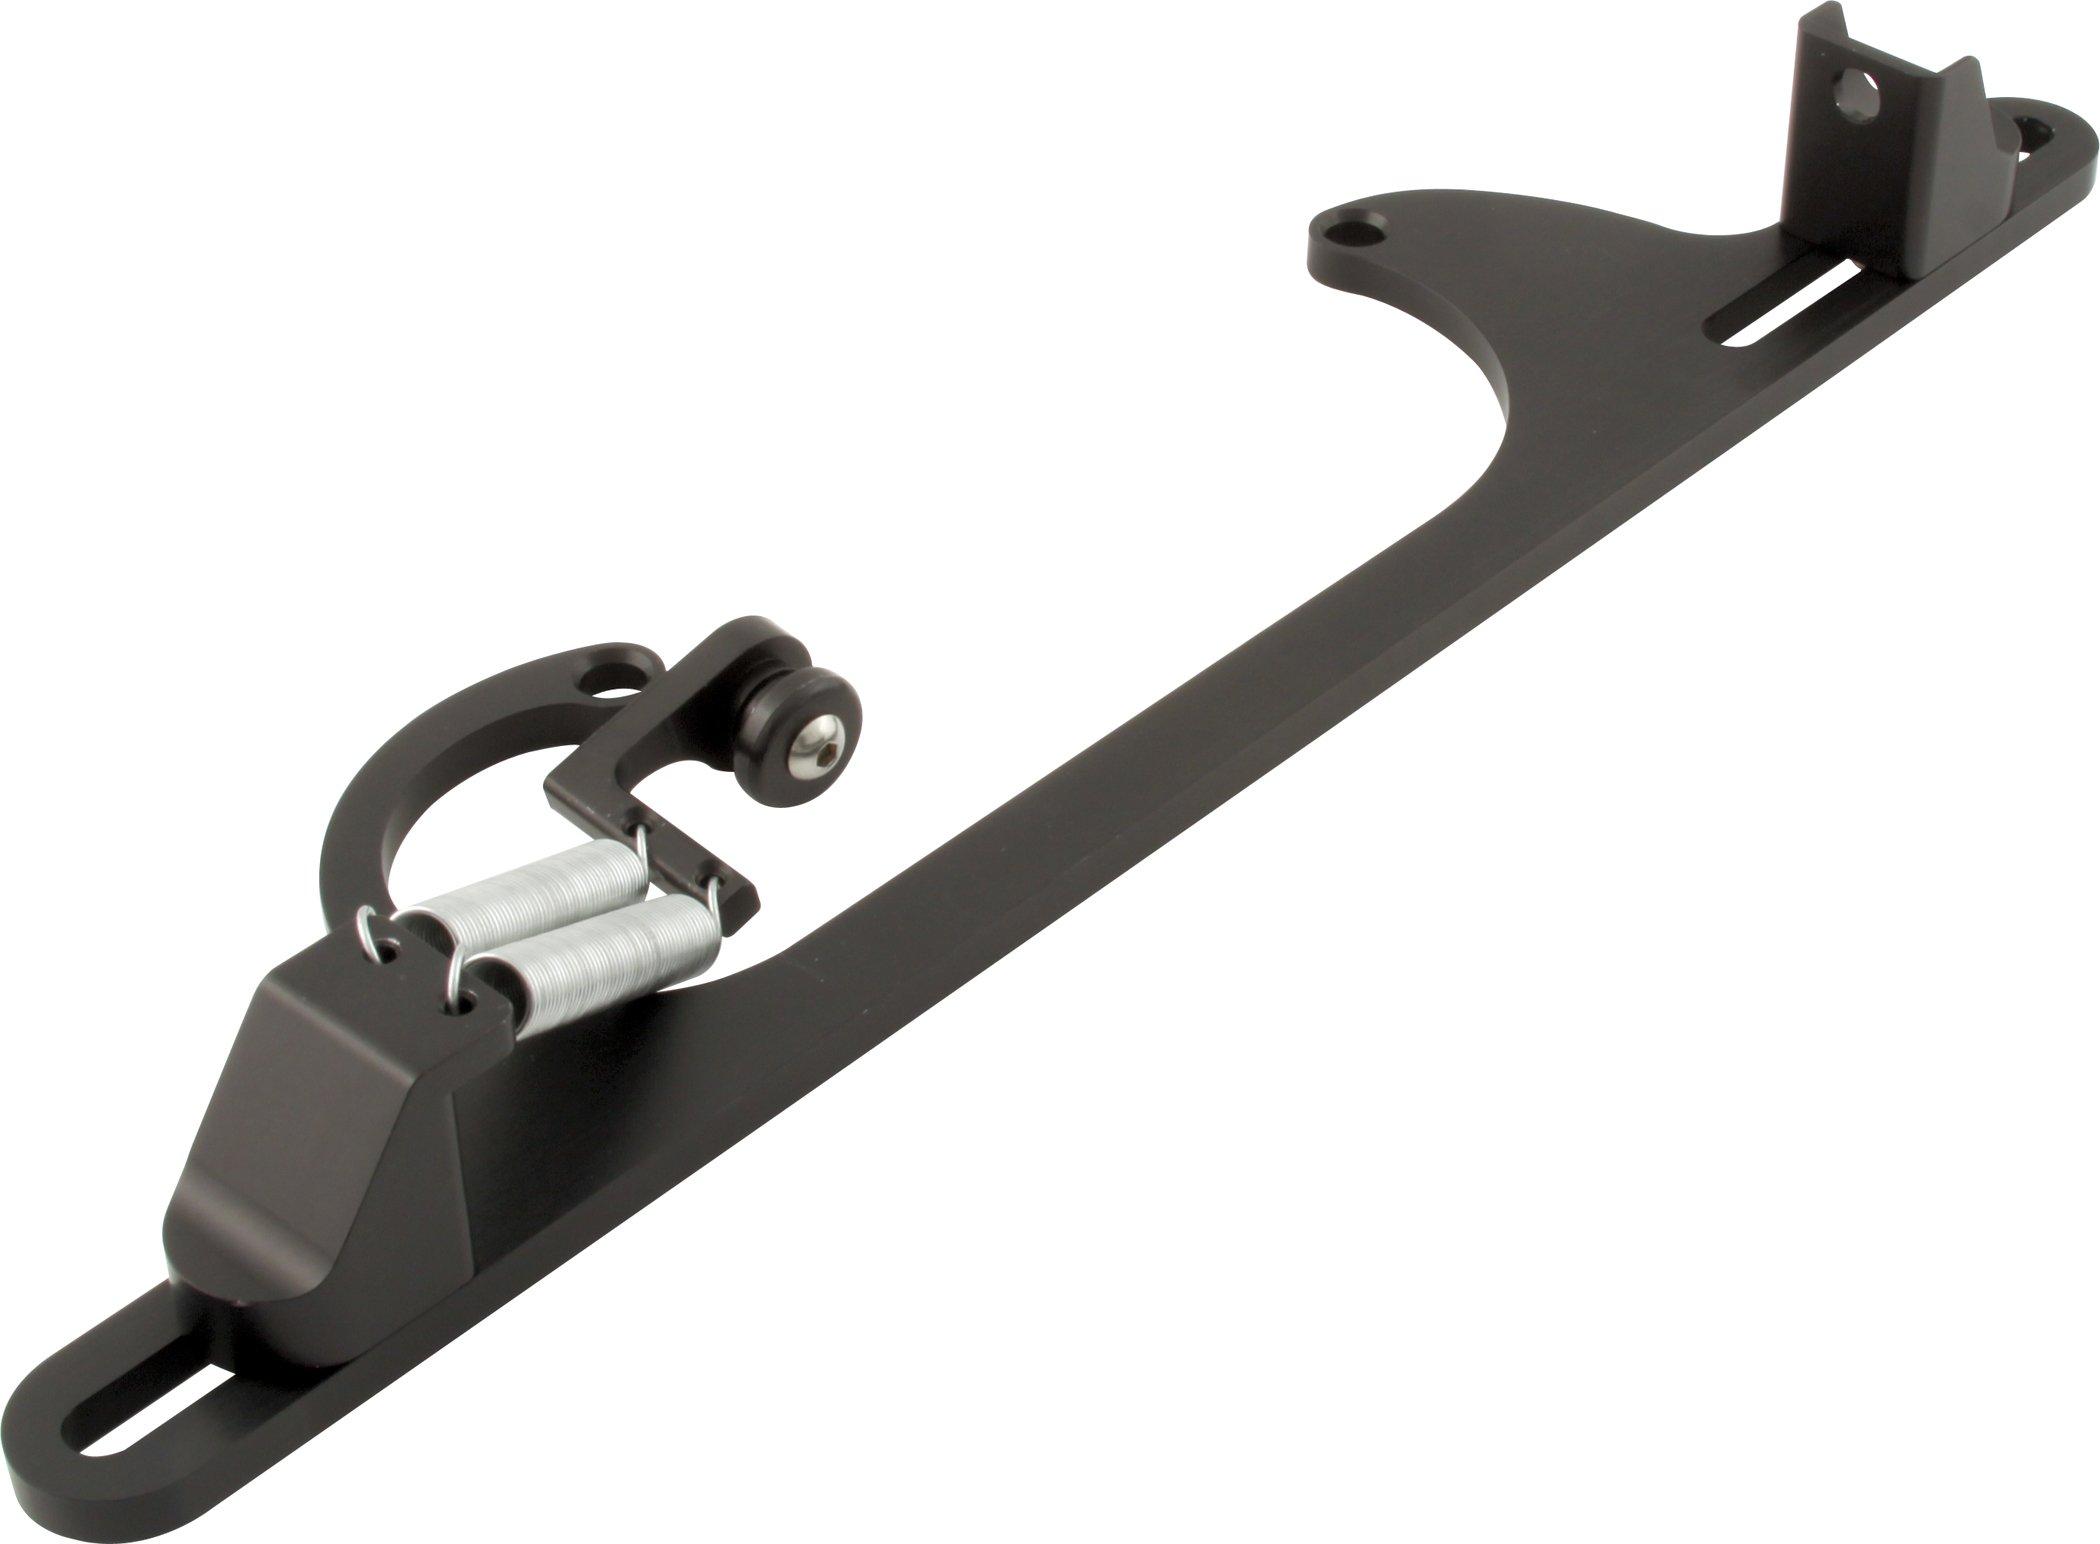 Allstar ALL54215 Throttle Cable Mounting Bracket by Allstar